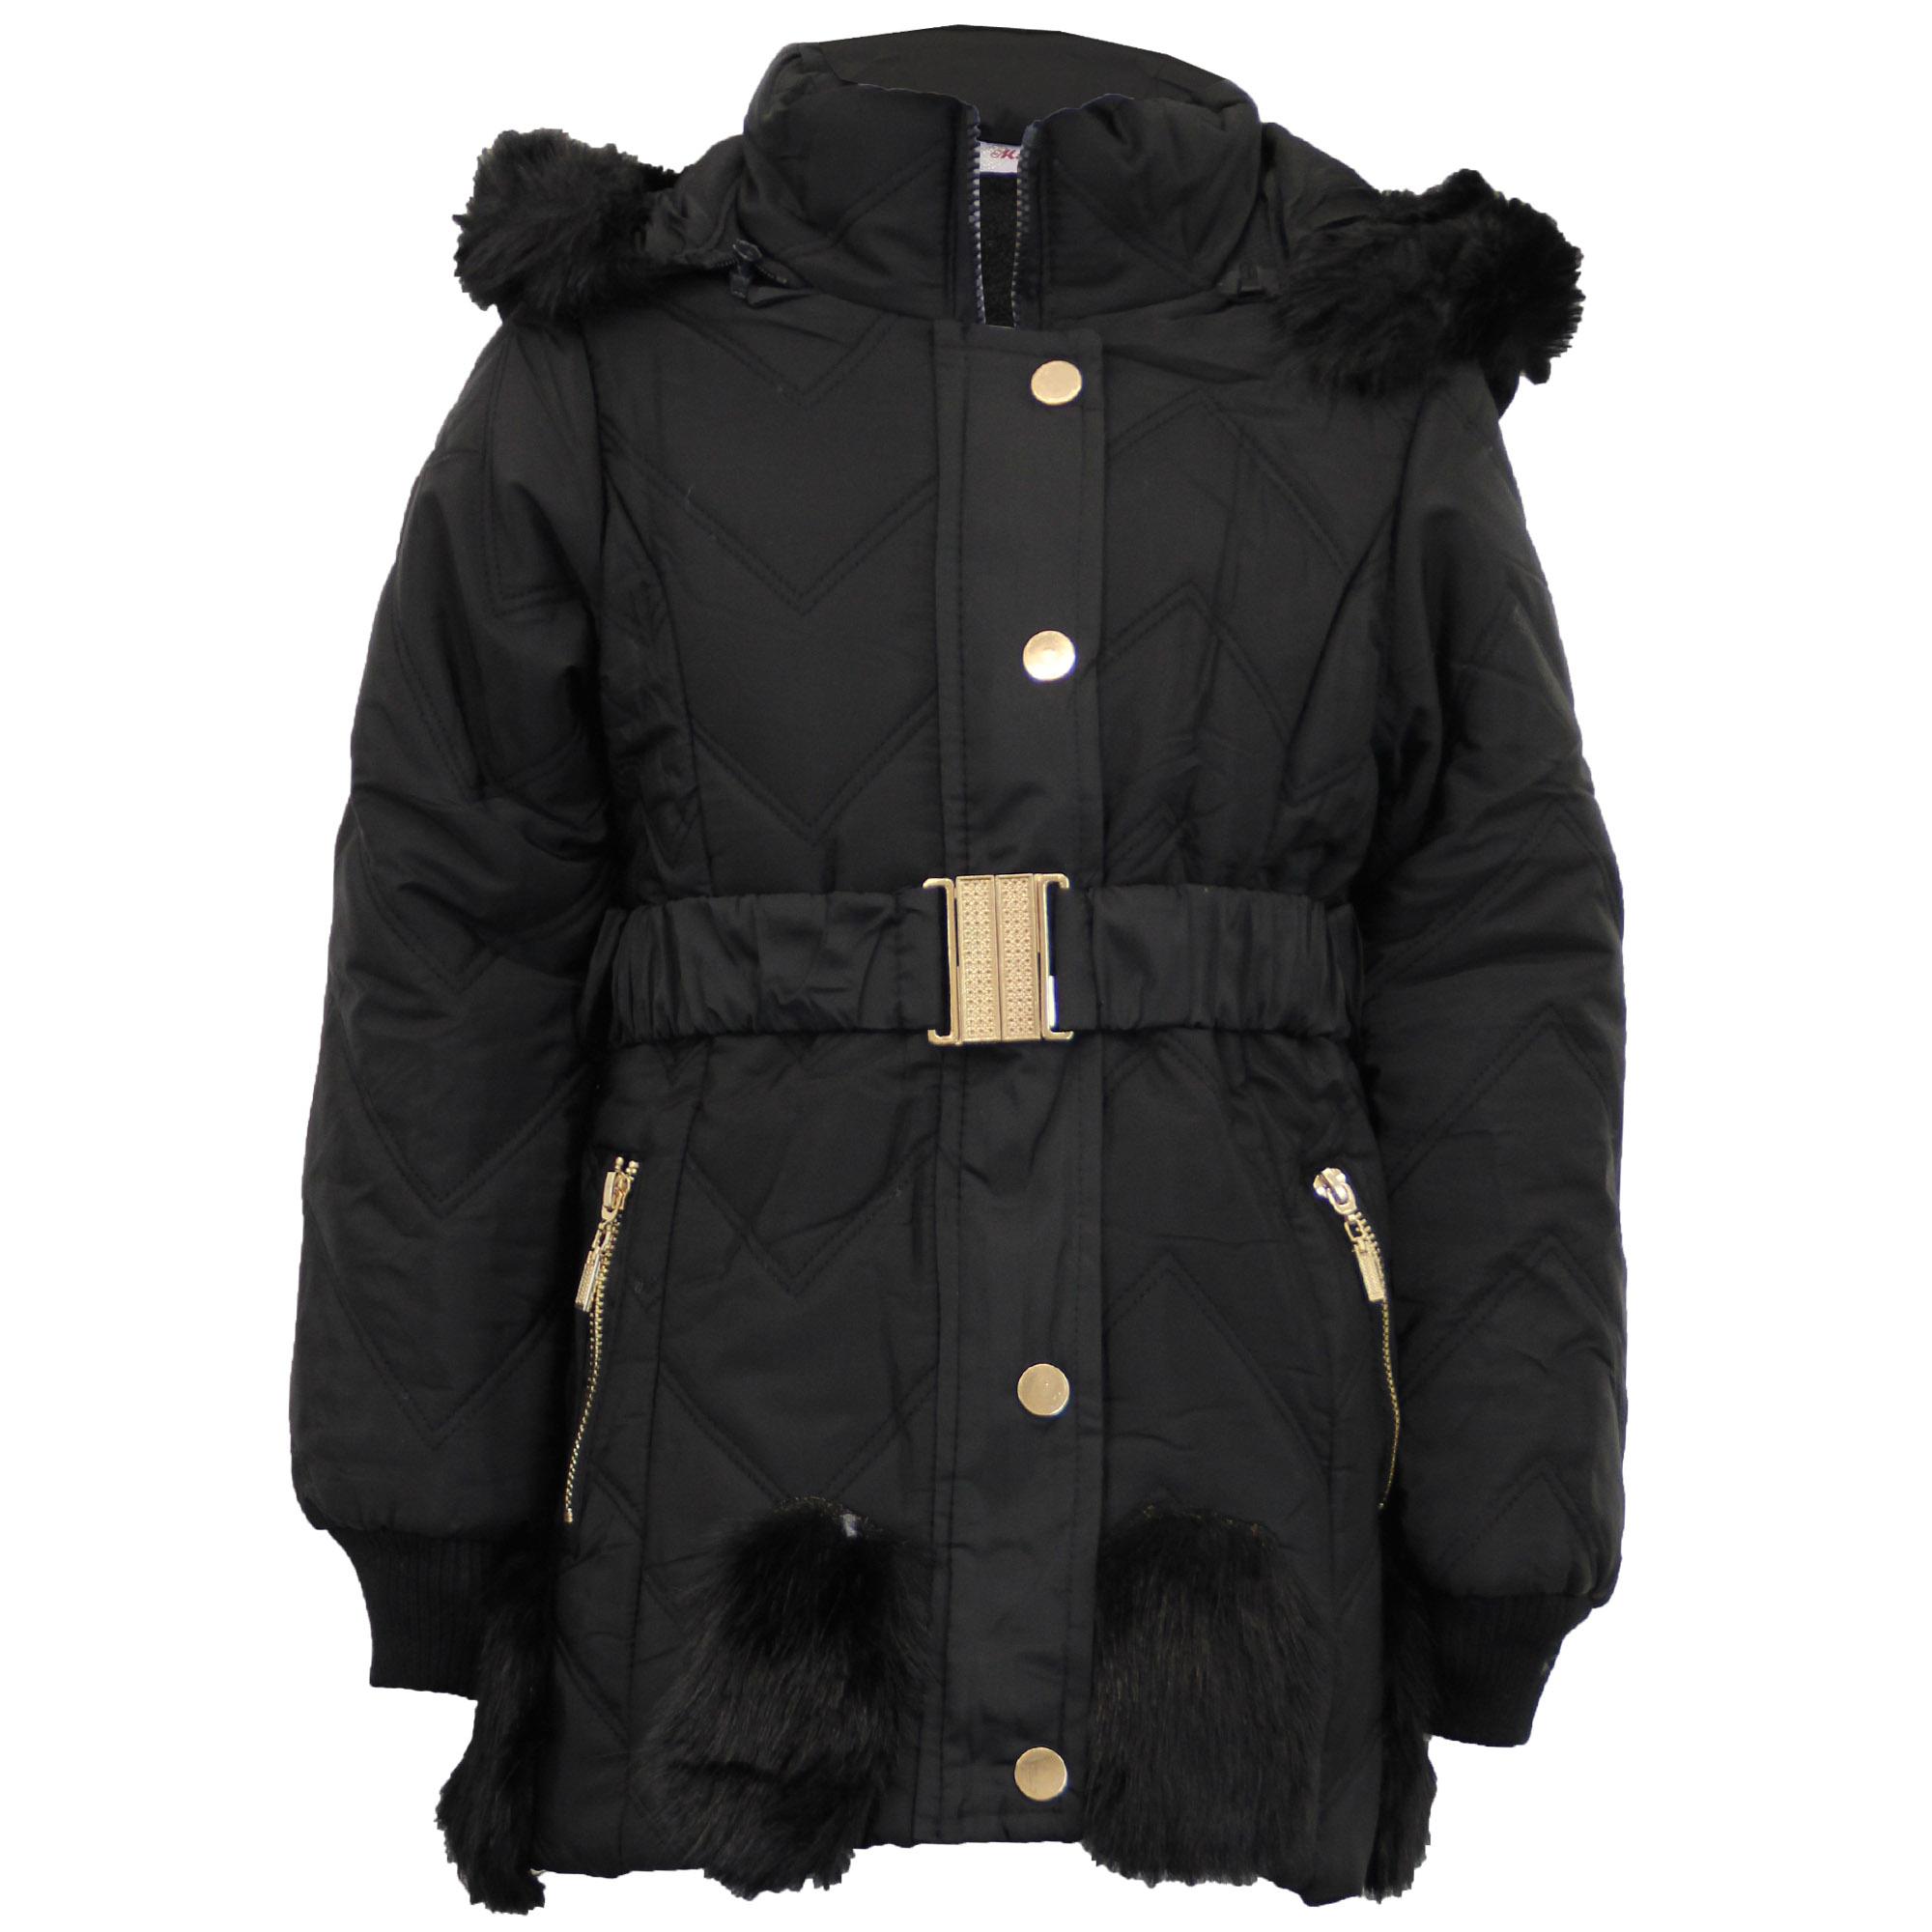 fb34c35f0125 Girls Padded Jacket Kids Coat Fur Hooded Quilted BELT Sherpa Fleece ...